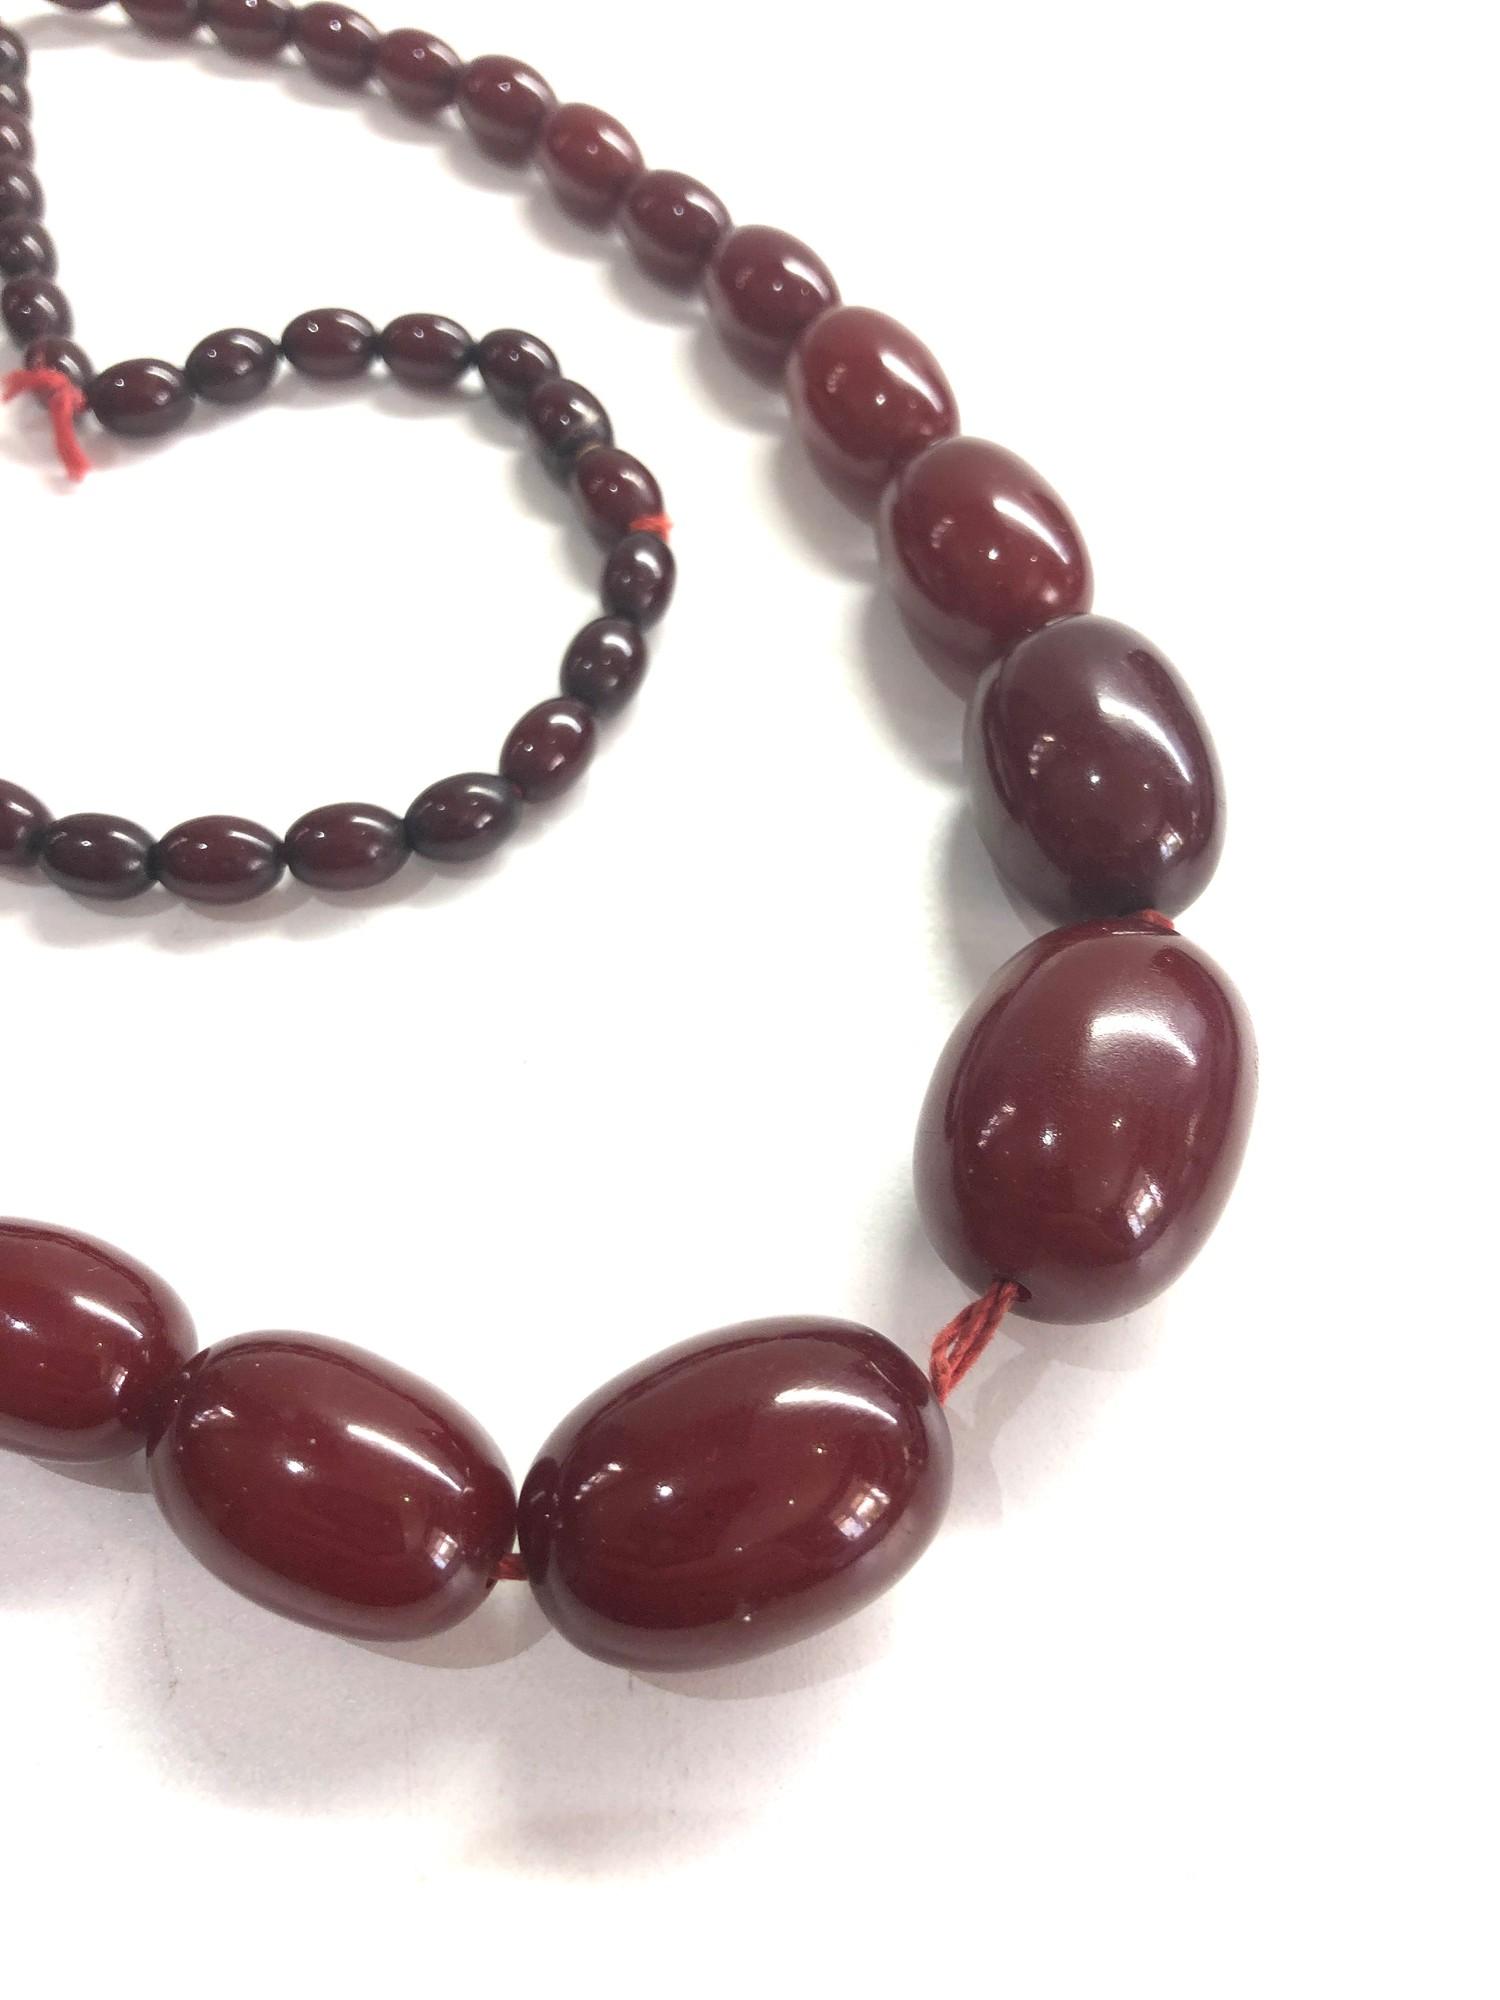 Cherry amber / bakelite bead necklace 59g no internal streaking - Image 2 of 3